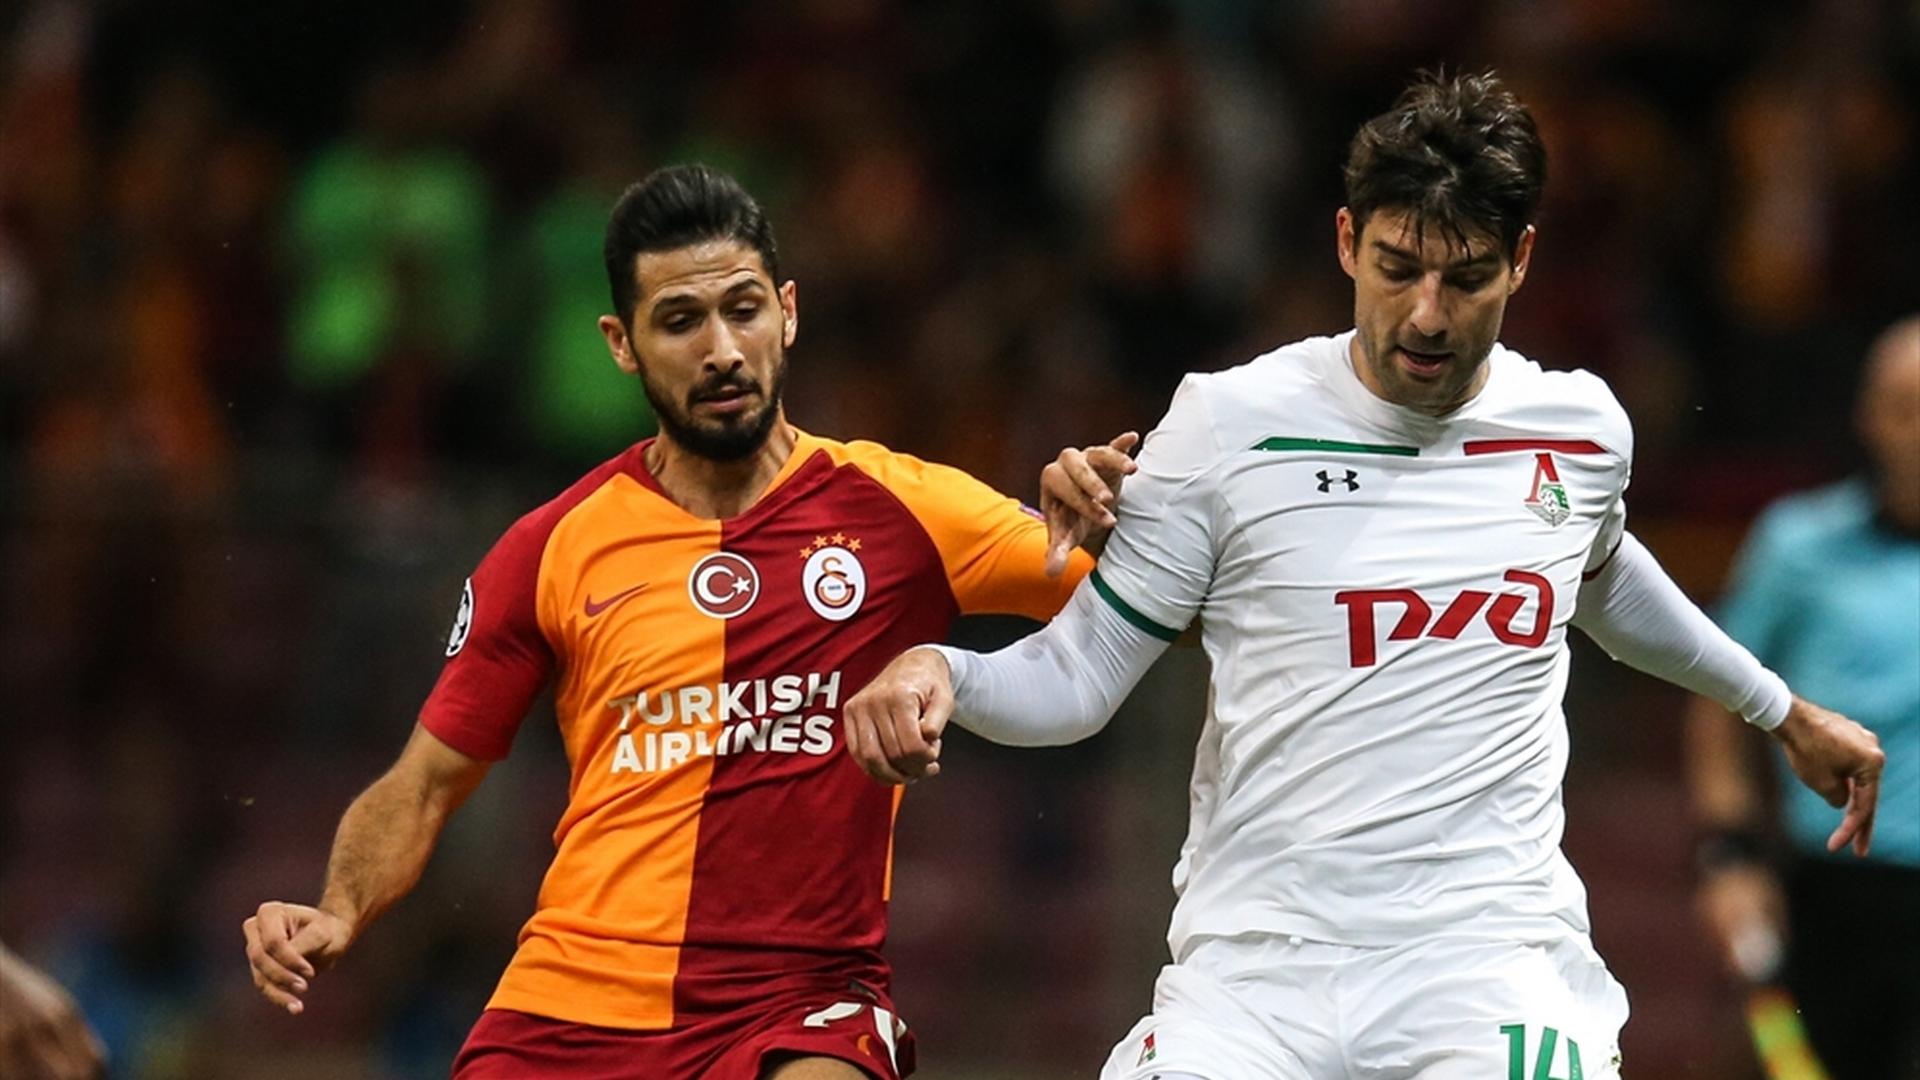 Emre Akbaba Vedran Corluka Galatasaray Lokomotiv Moscow 9182018 UCL